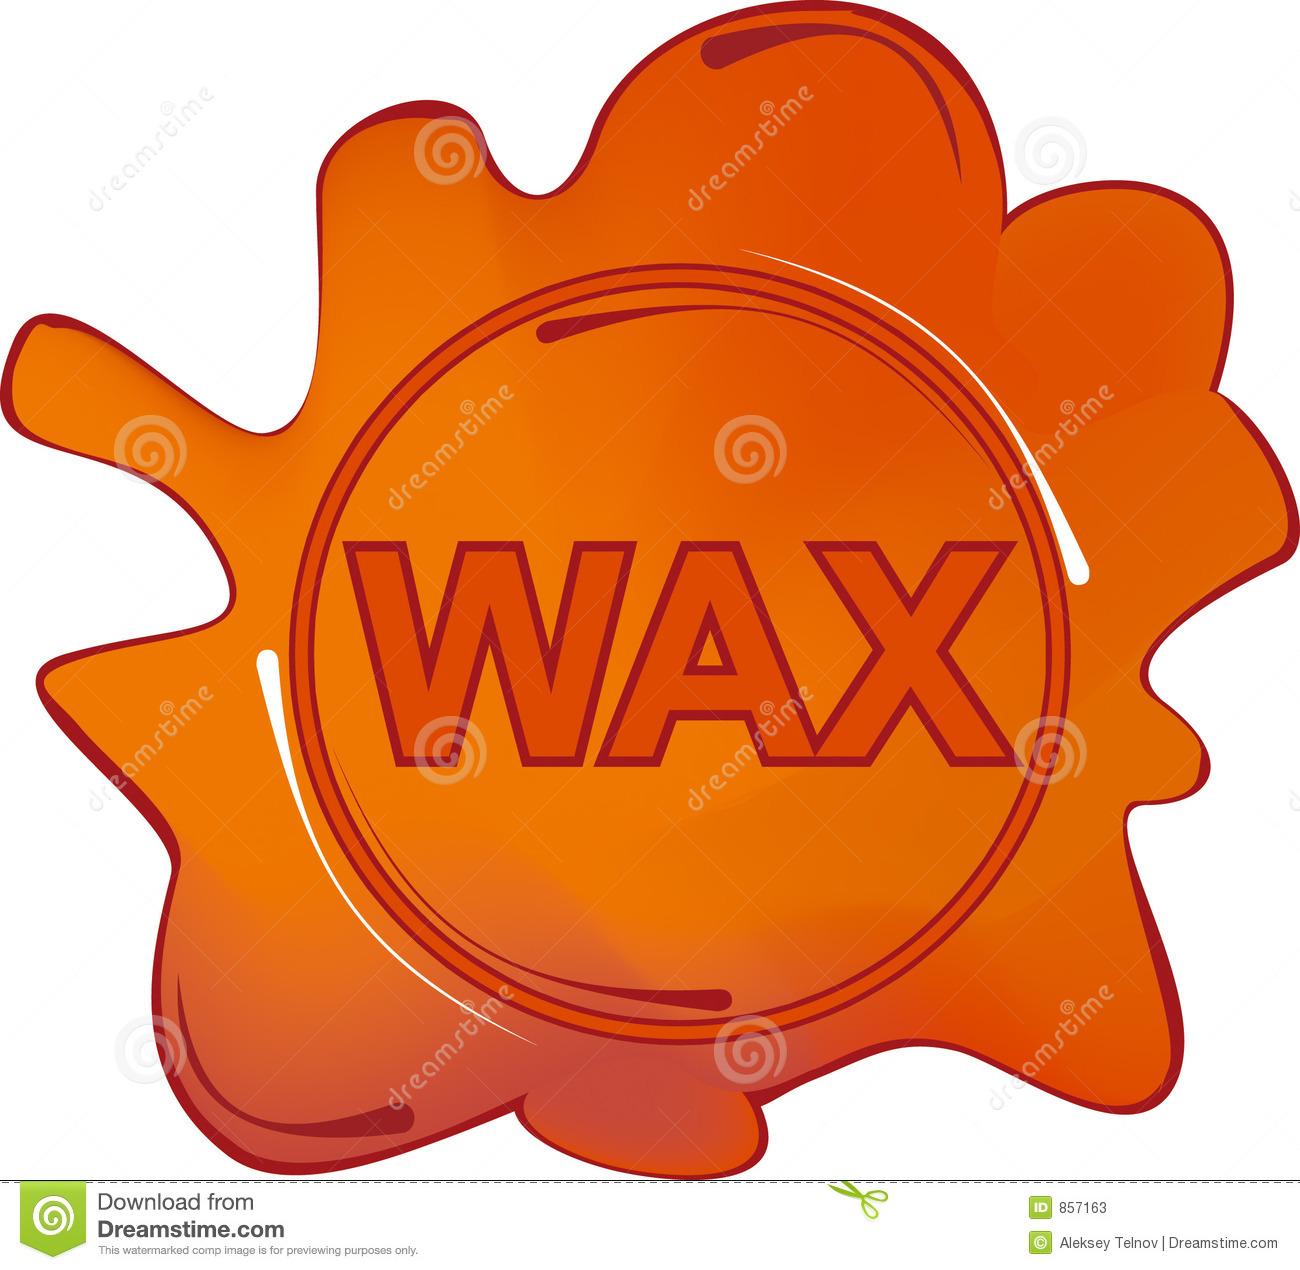 Wax clipart - Clipground